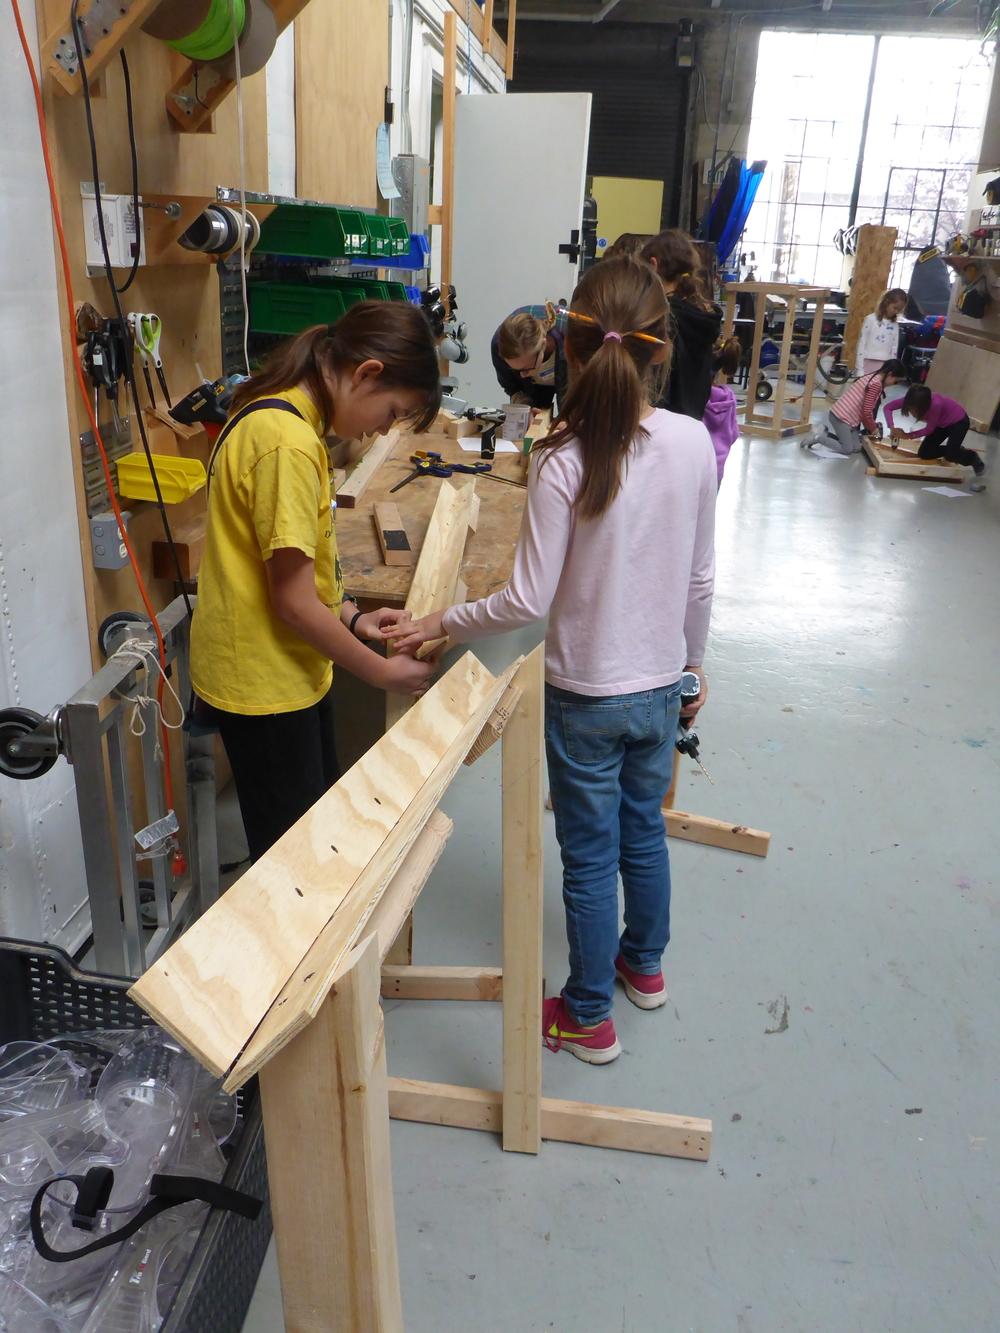 The egg transporter team already has 2 ramps built!!